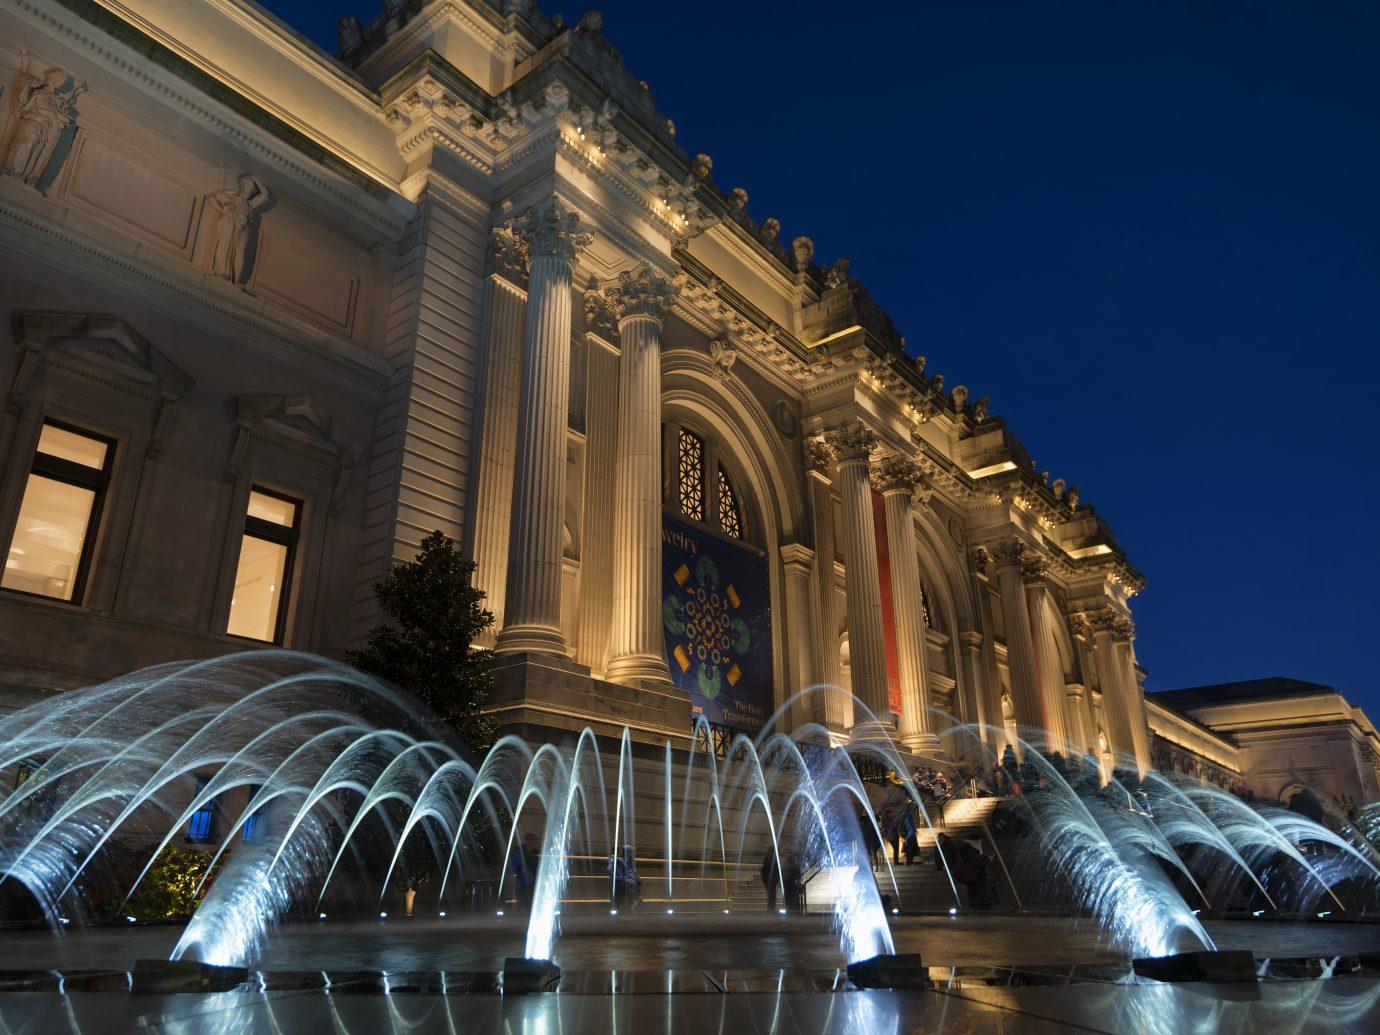 New York, NY, USA - November 11, 2018. Fountain at the Metropolitan Museum of Art in New York City.